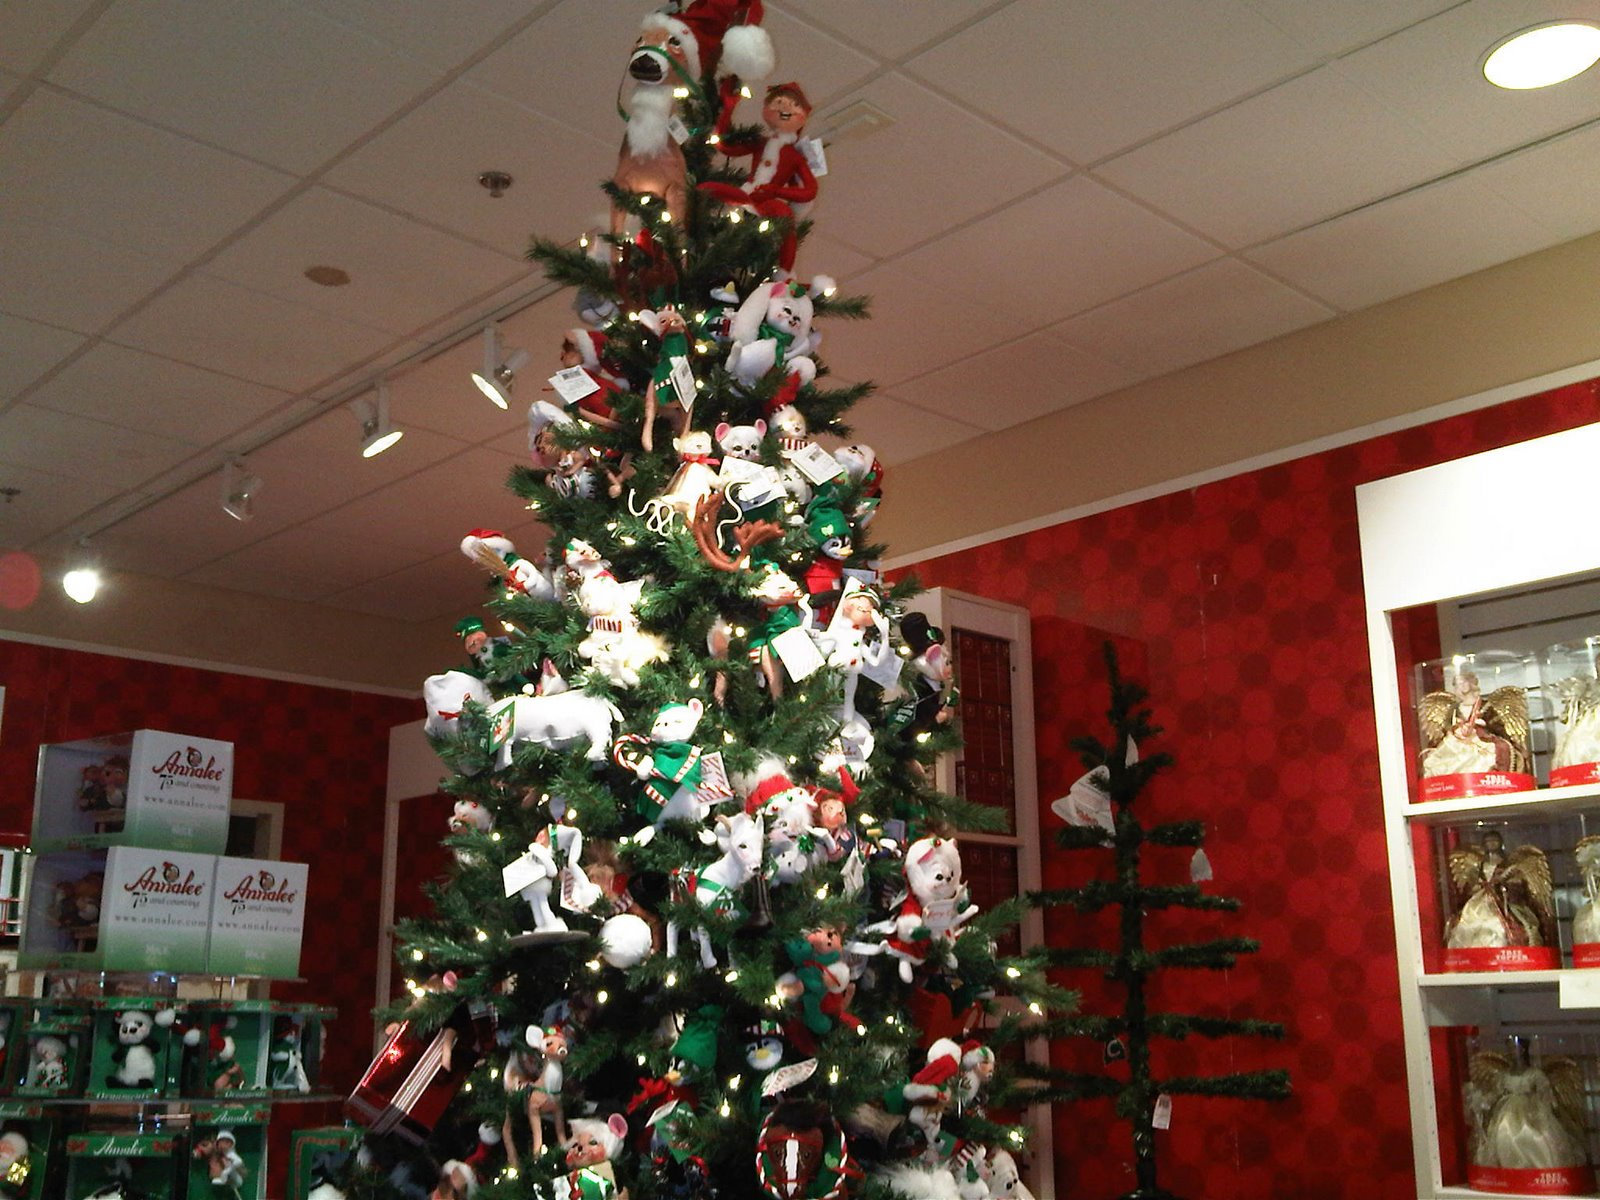 Copeland Christmas Blog: Themed Trees for 2010 Copeland ...